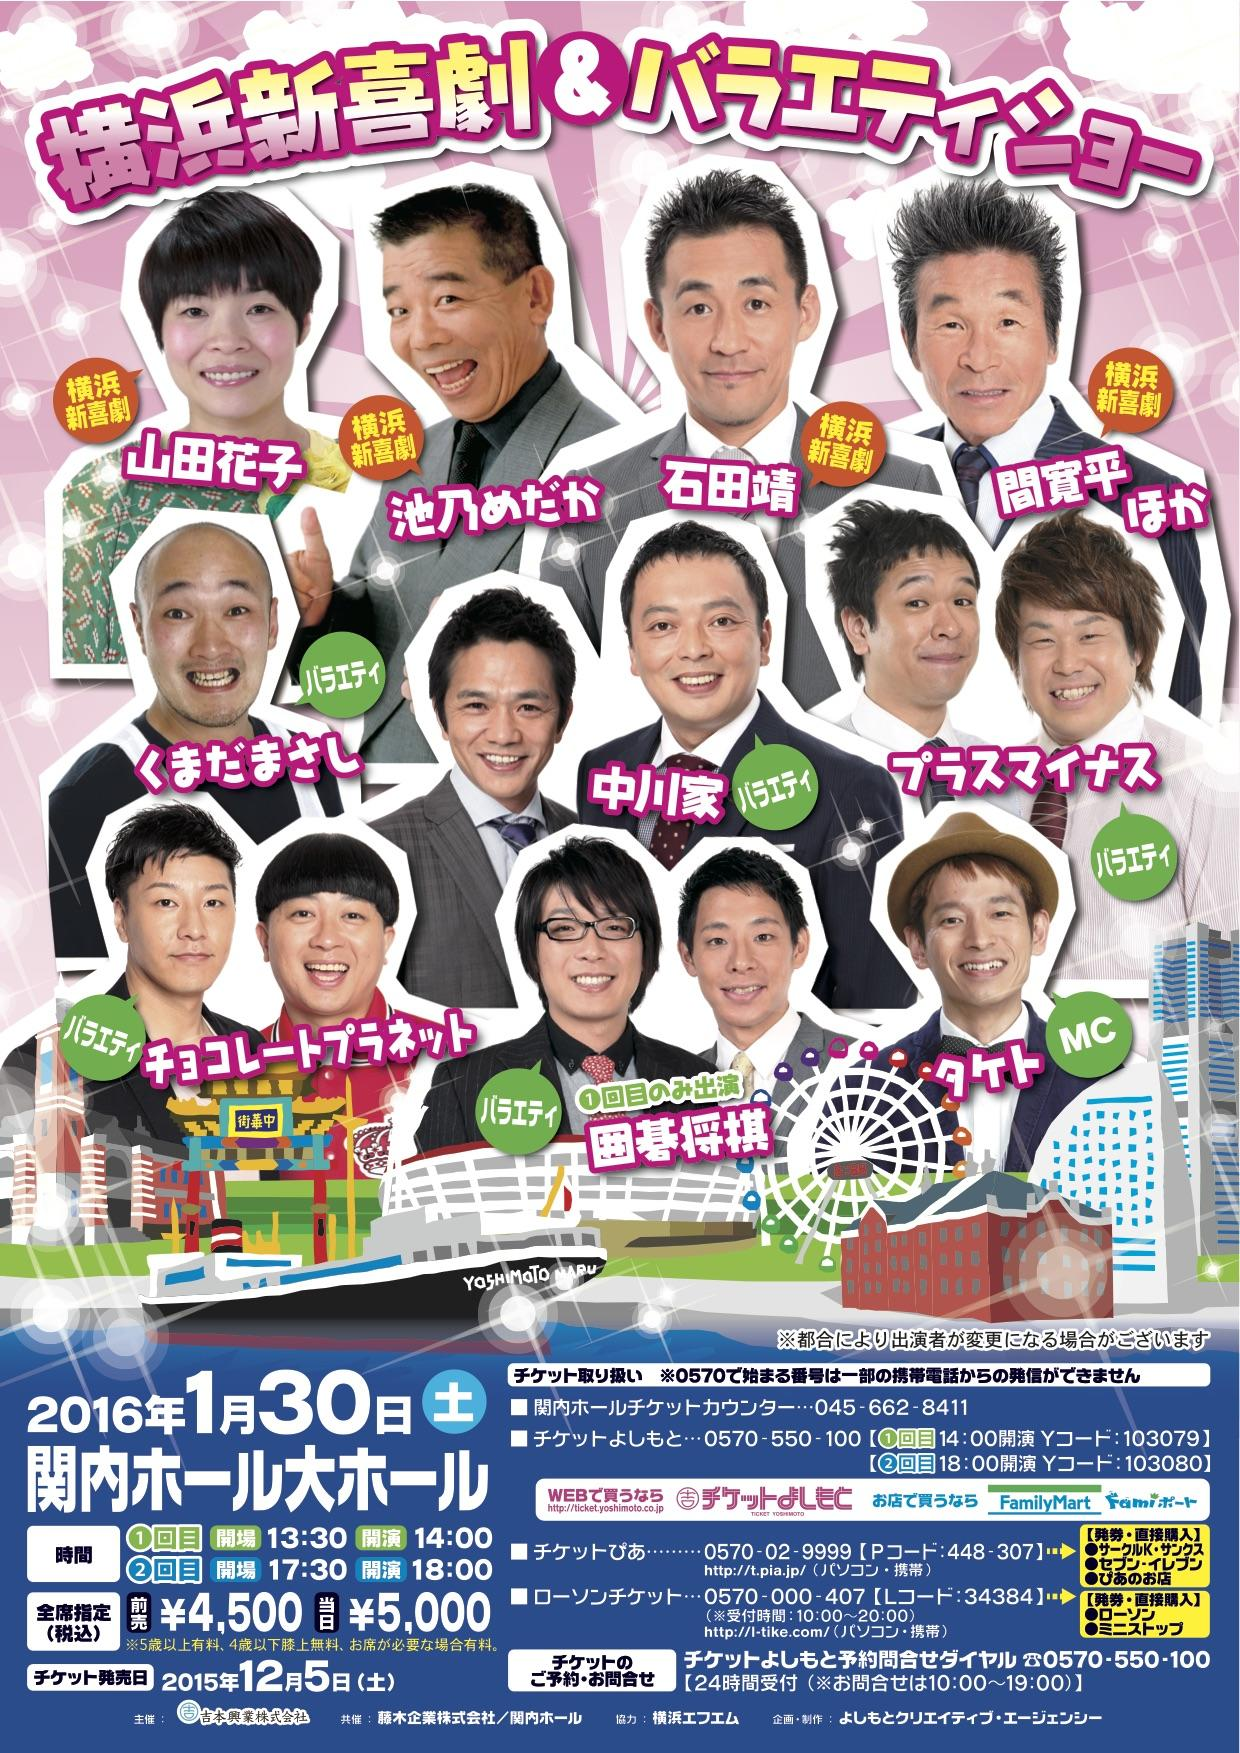 http://www.syumatsu.jp/20151201175410-c3449980e68aa80d879409188876bd26513eee7e.jpg